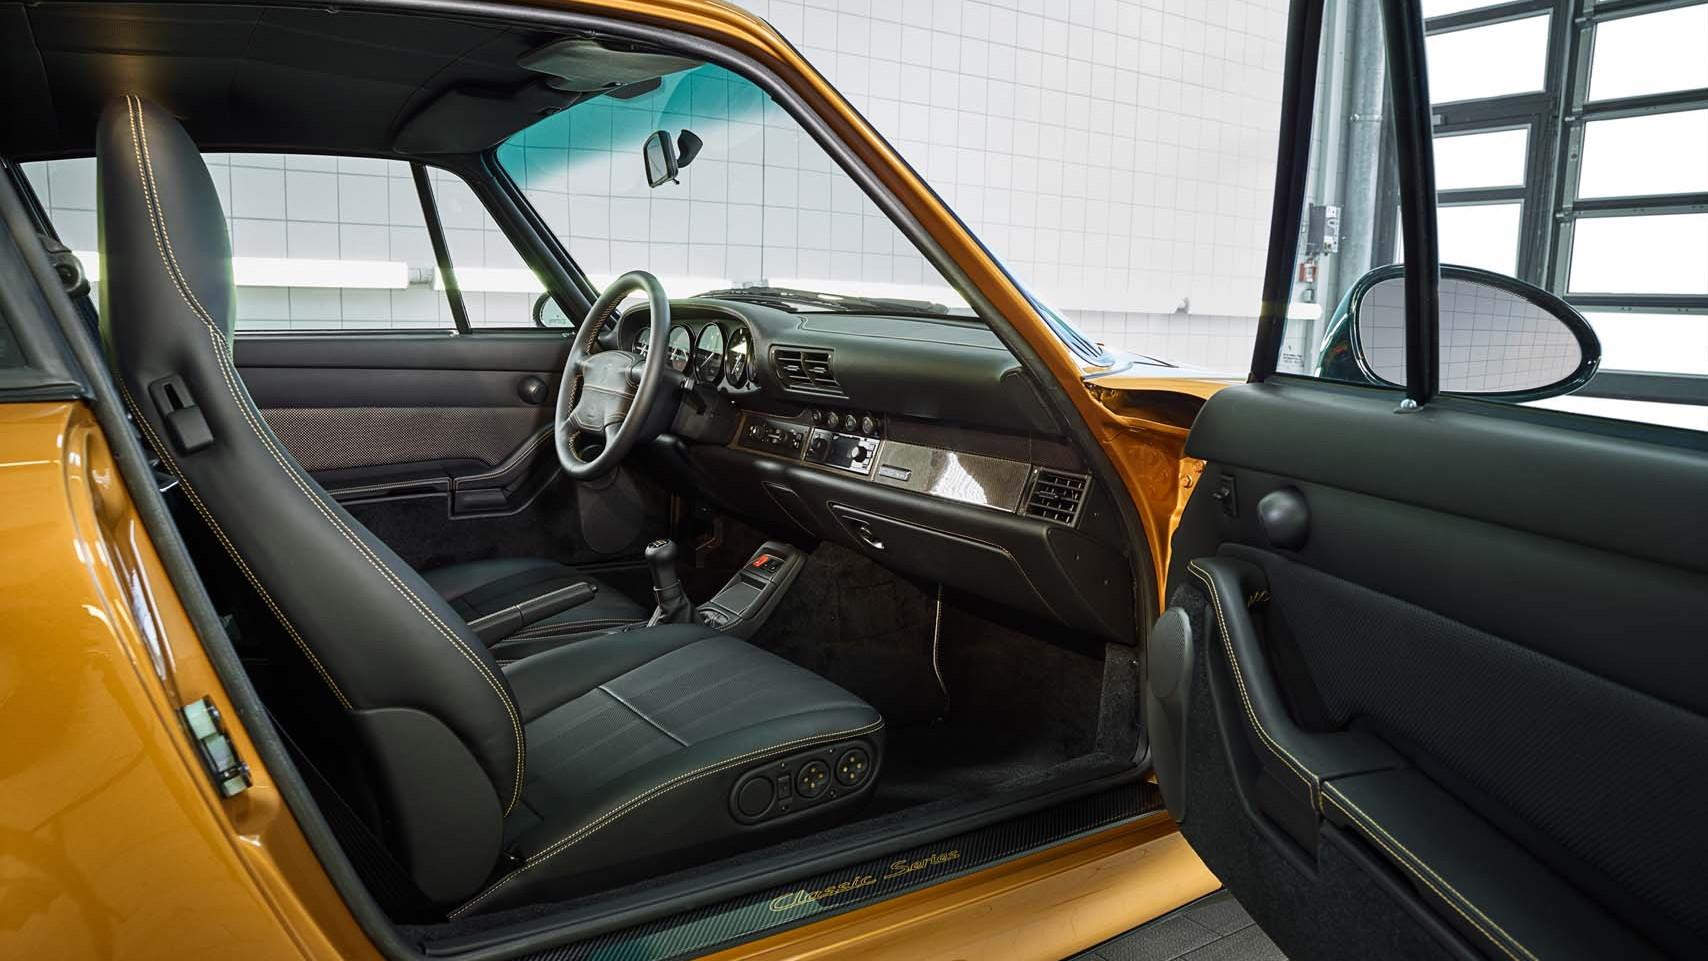 Project Gold: 911 restomod